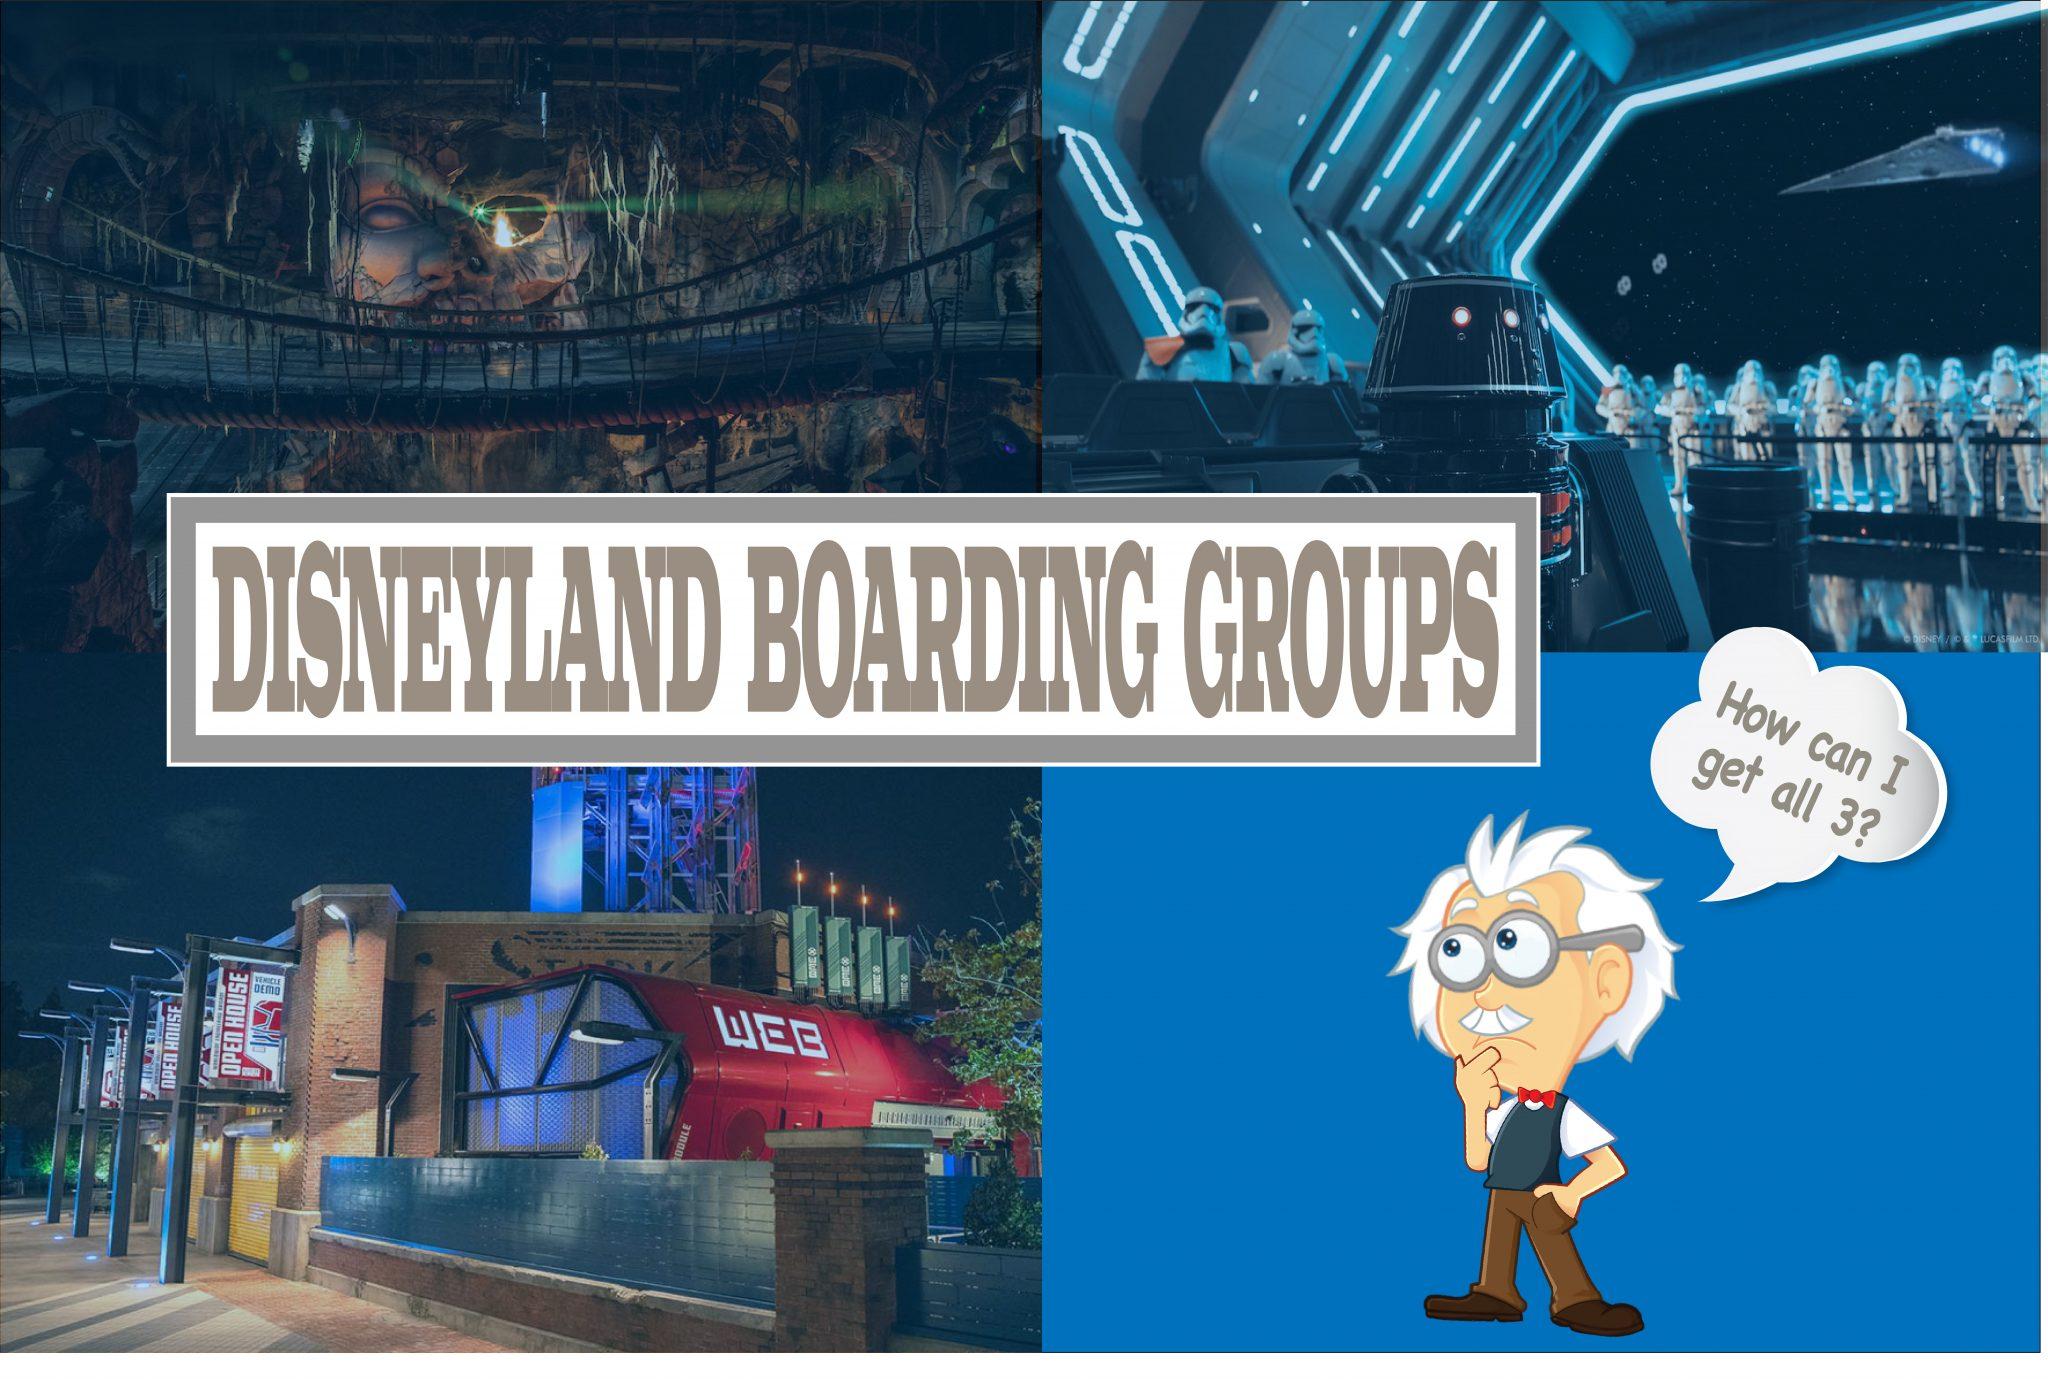 Disneyland Boarding Groups